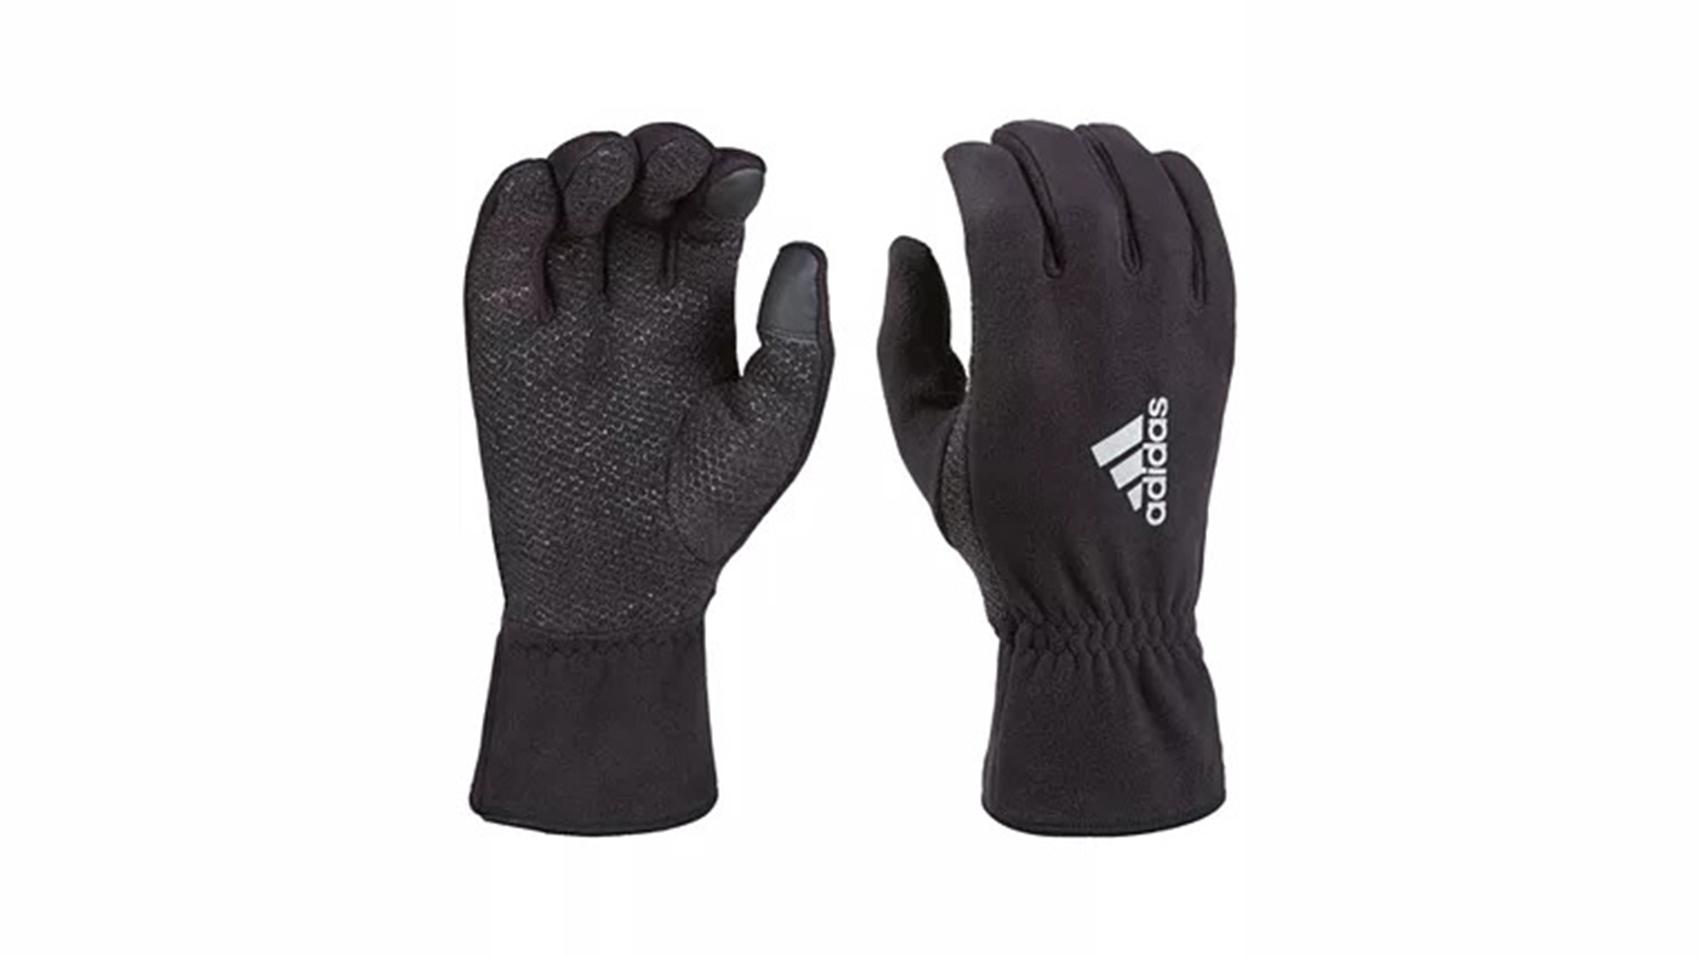 UK Men/'s Winter Warm Waterproof Gloves Motorcycle Sports Fishing Non-Slip Gloves